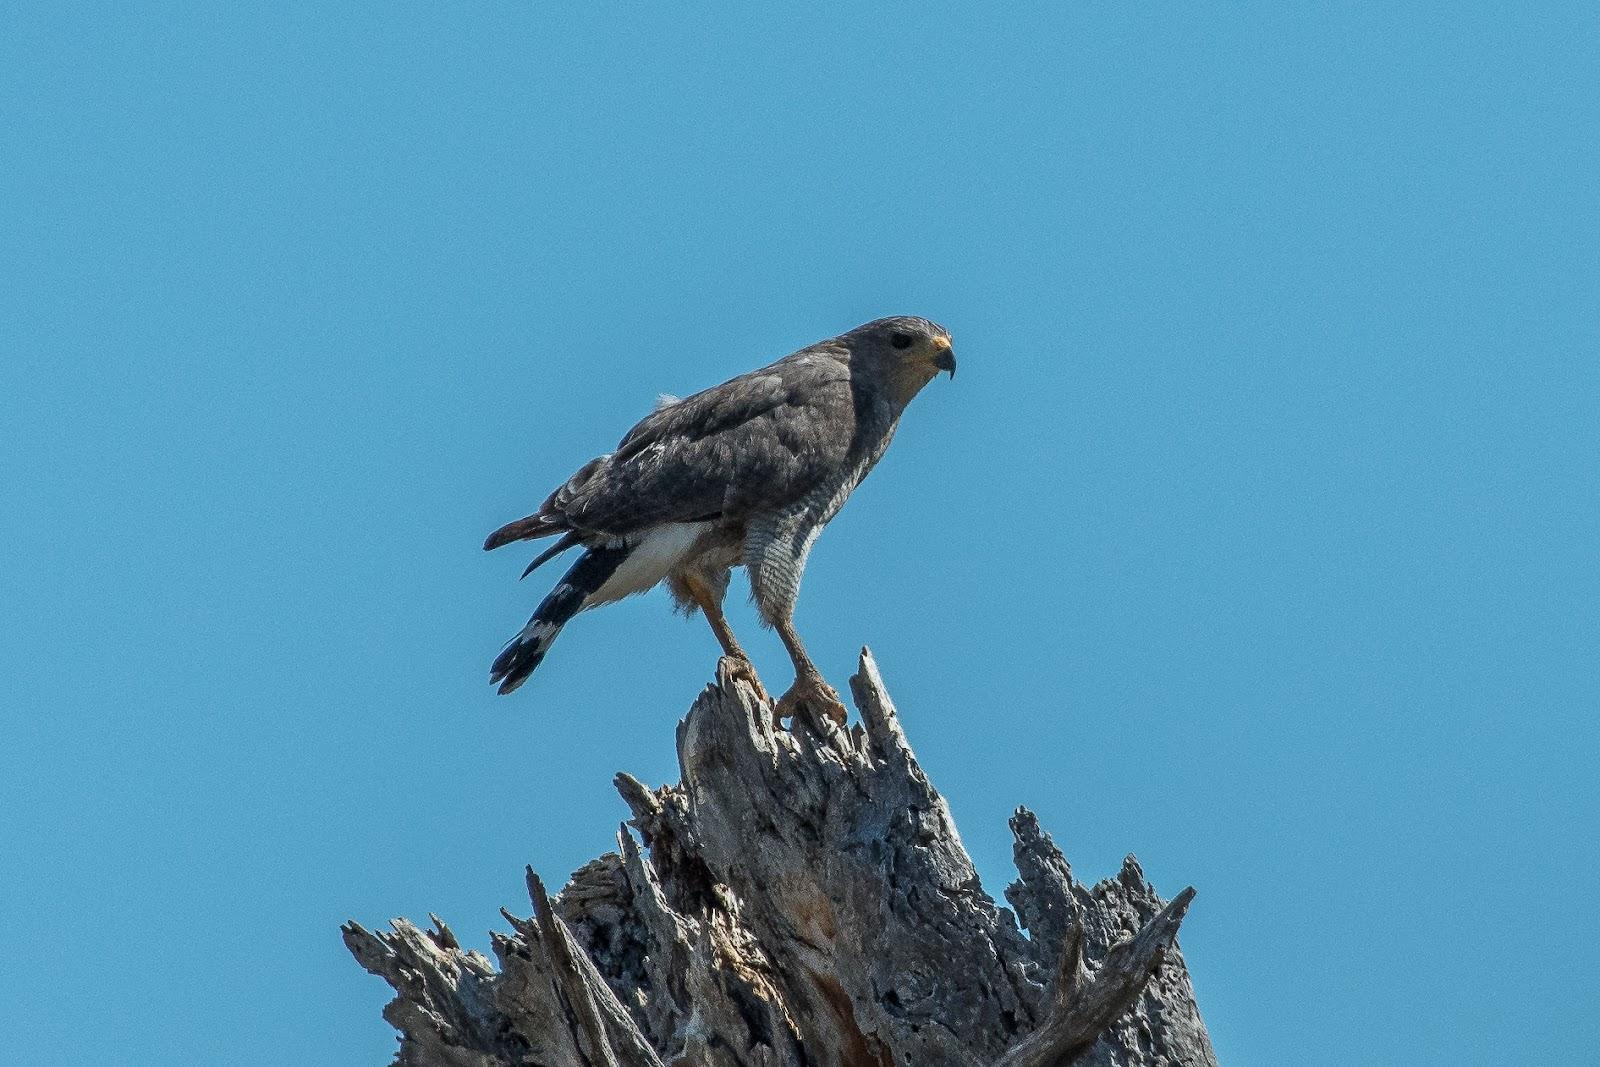 Neovista Birding Arizona Feathers Scales Tails Shells